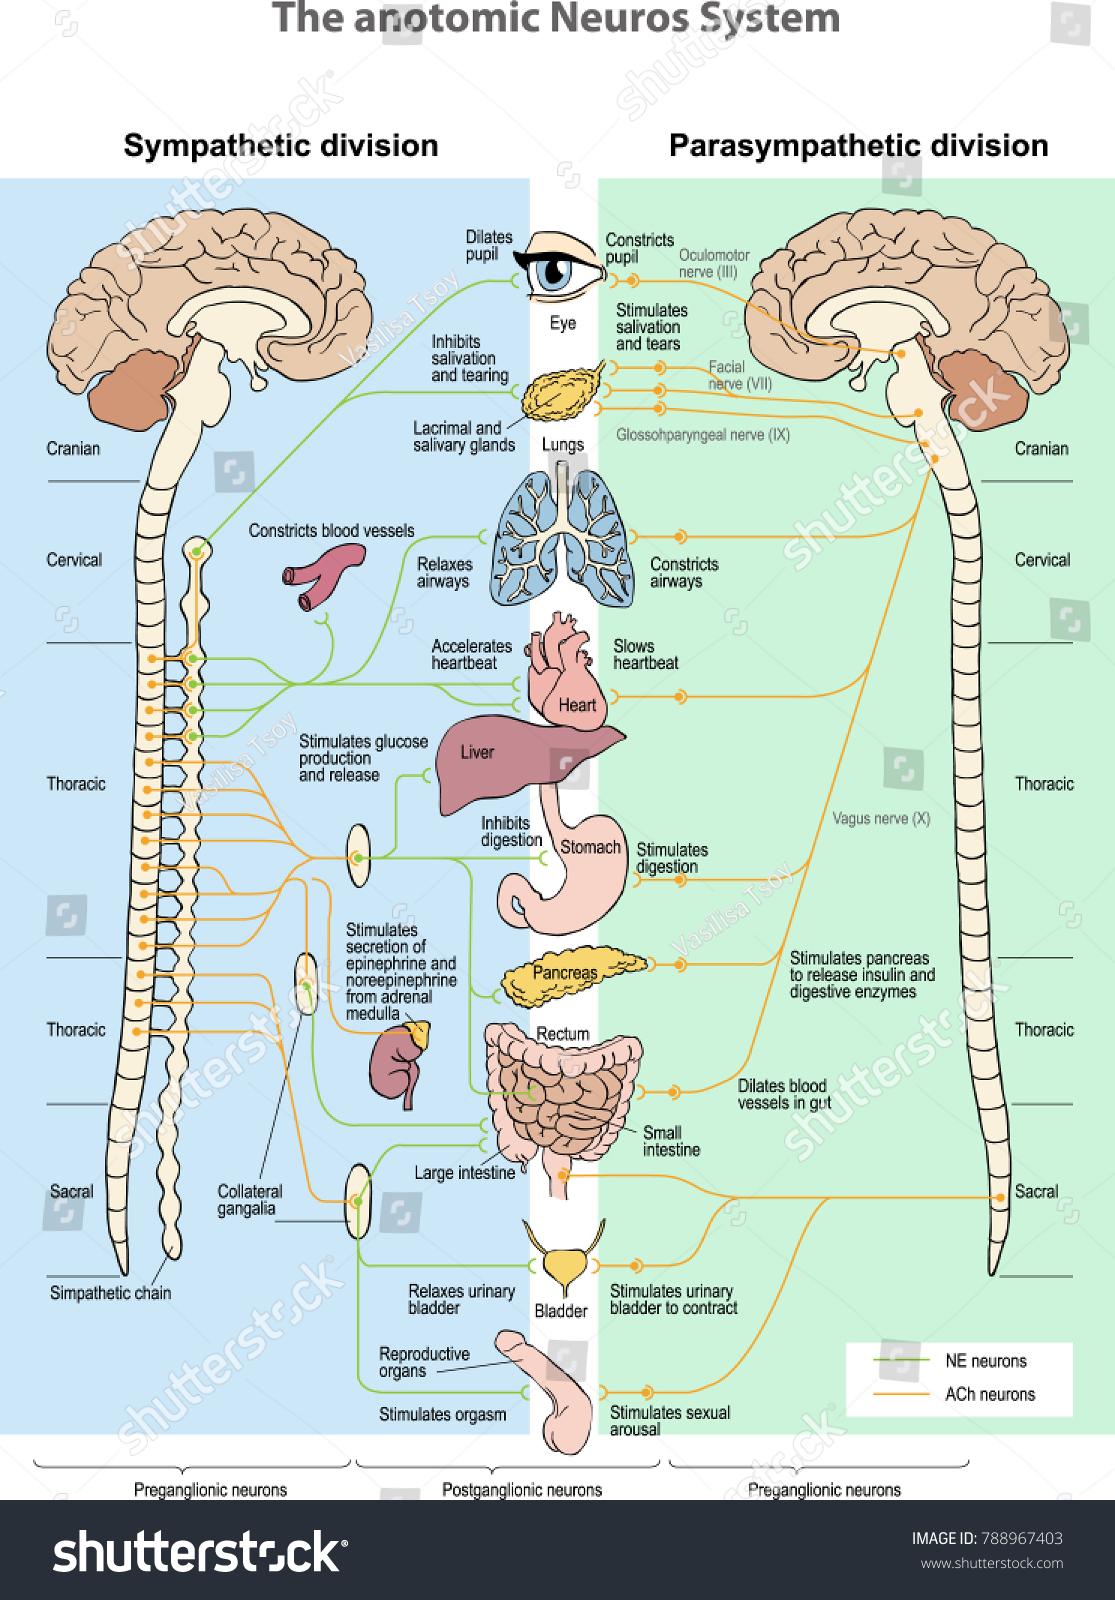 Anotomic Neuros System Sympathetic Division Parasympathetic Stock ...